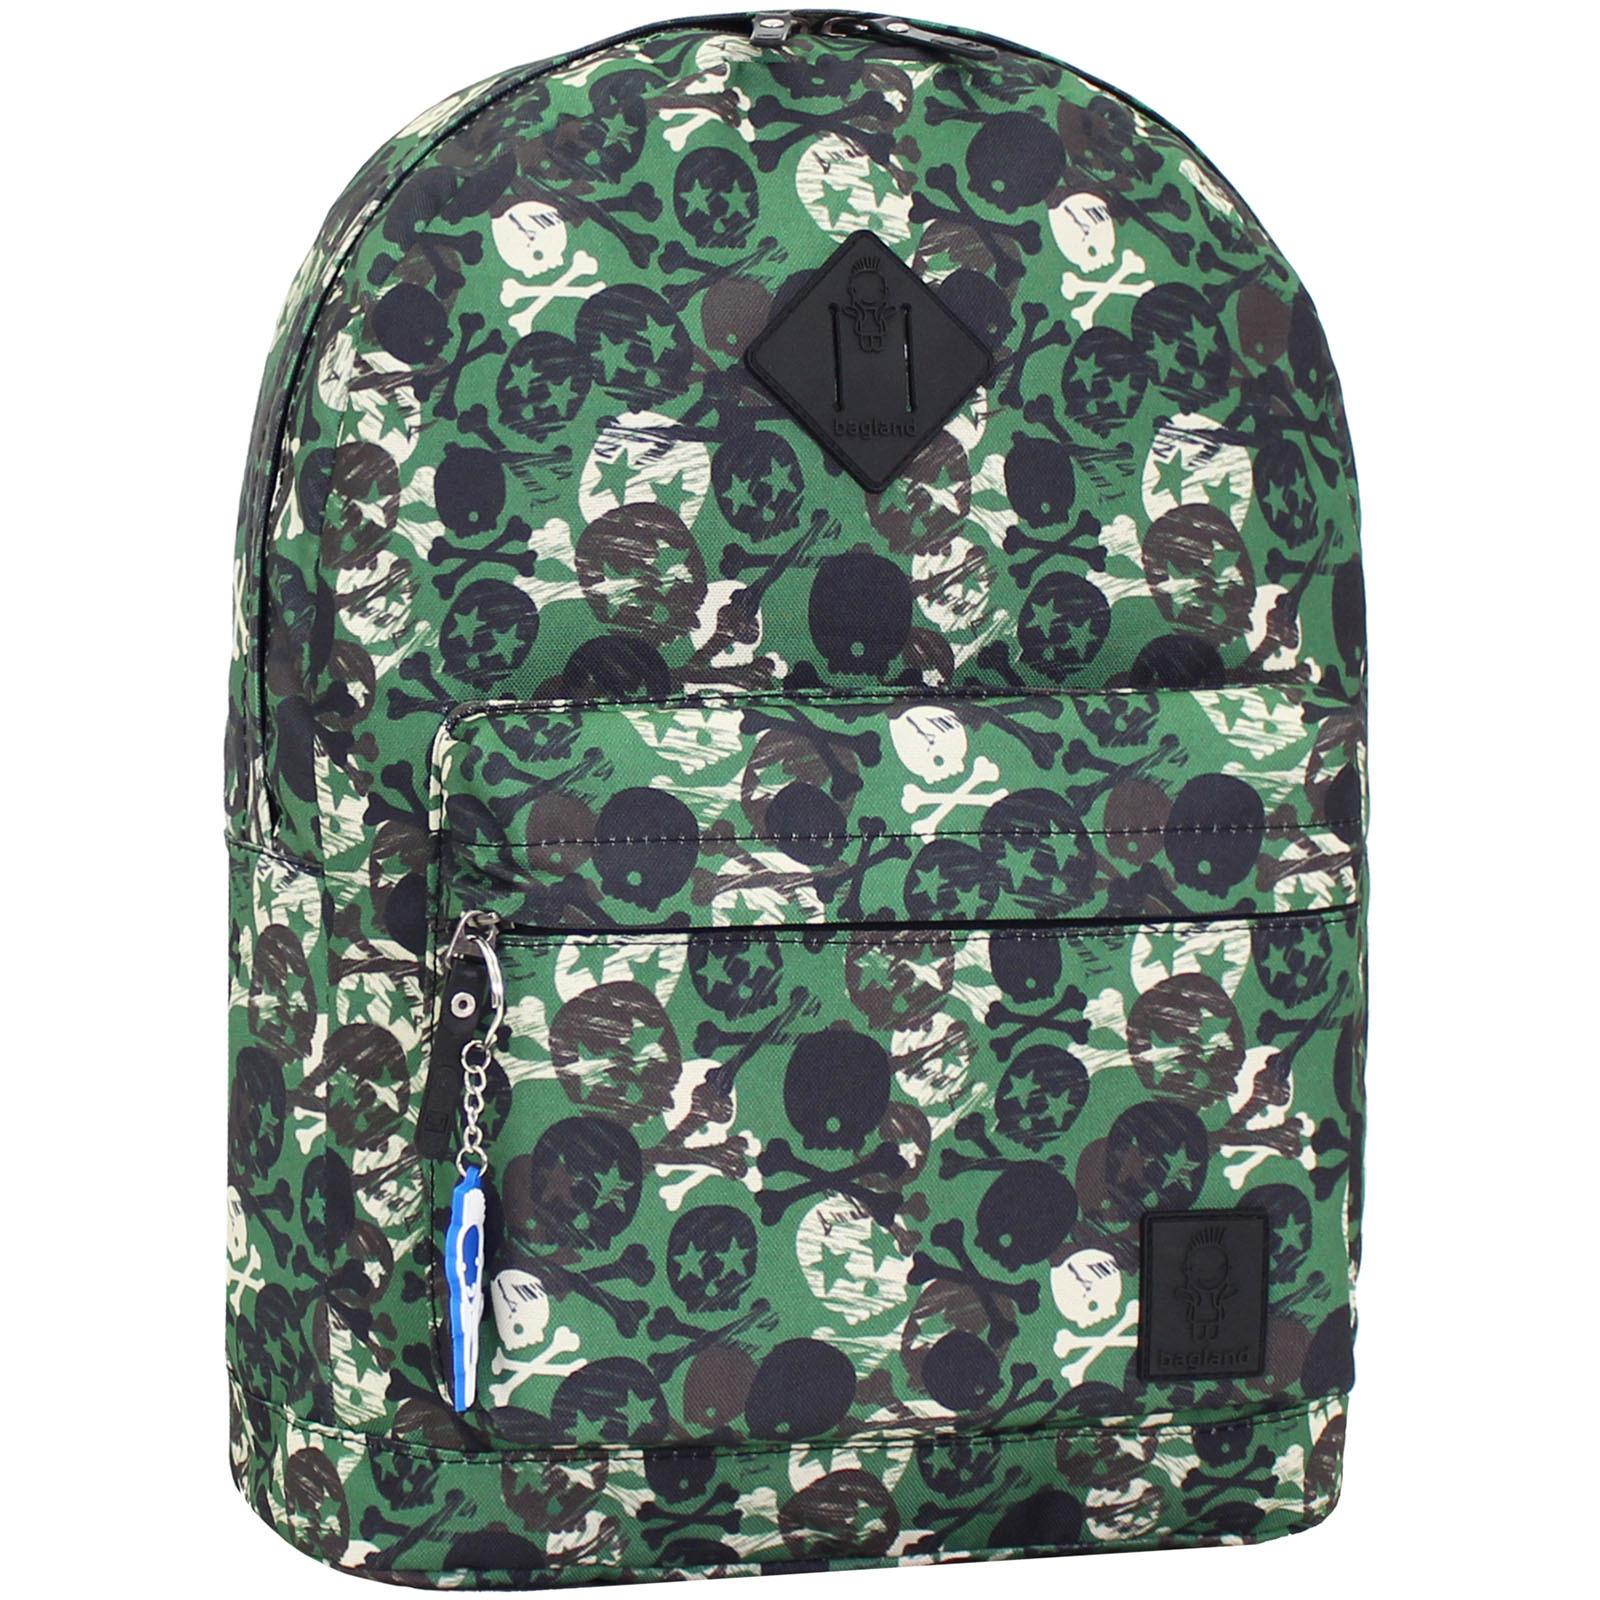 Городские рюкзаки Рюкзак Bagland Молодежный (дизайн) 17 л. сублимация 230 (00533664) IMG_1143_230.JPG